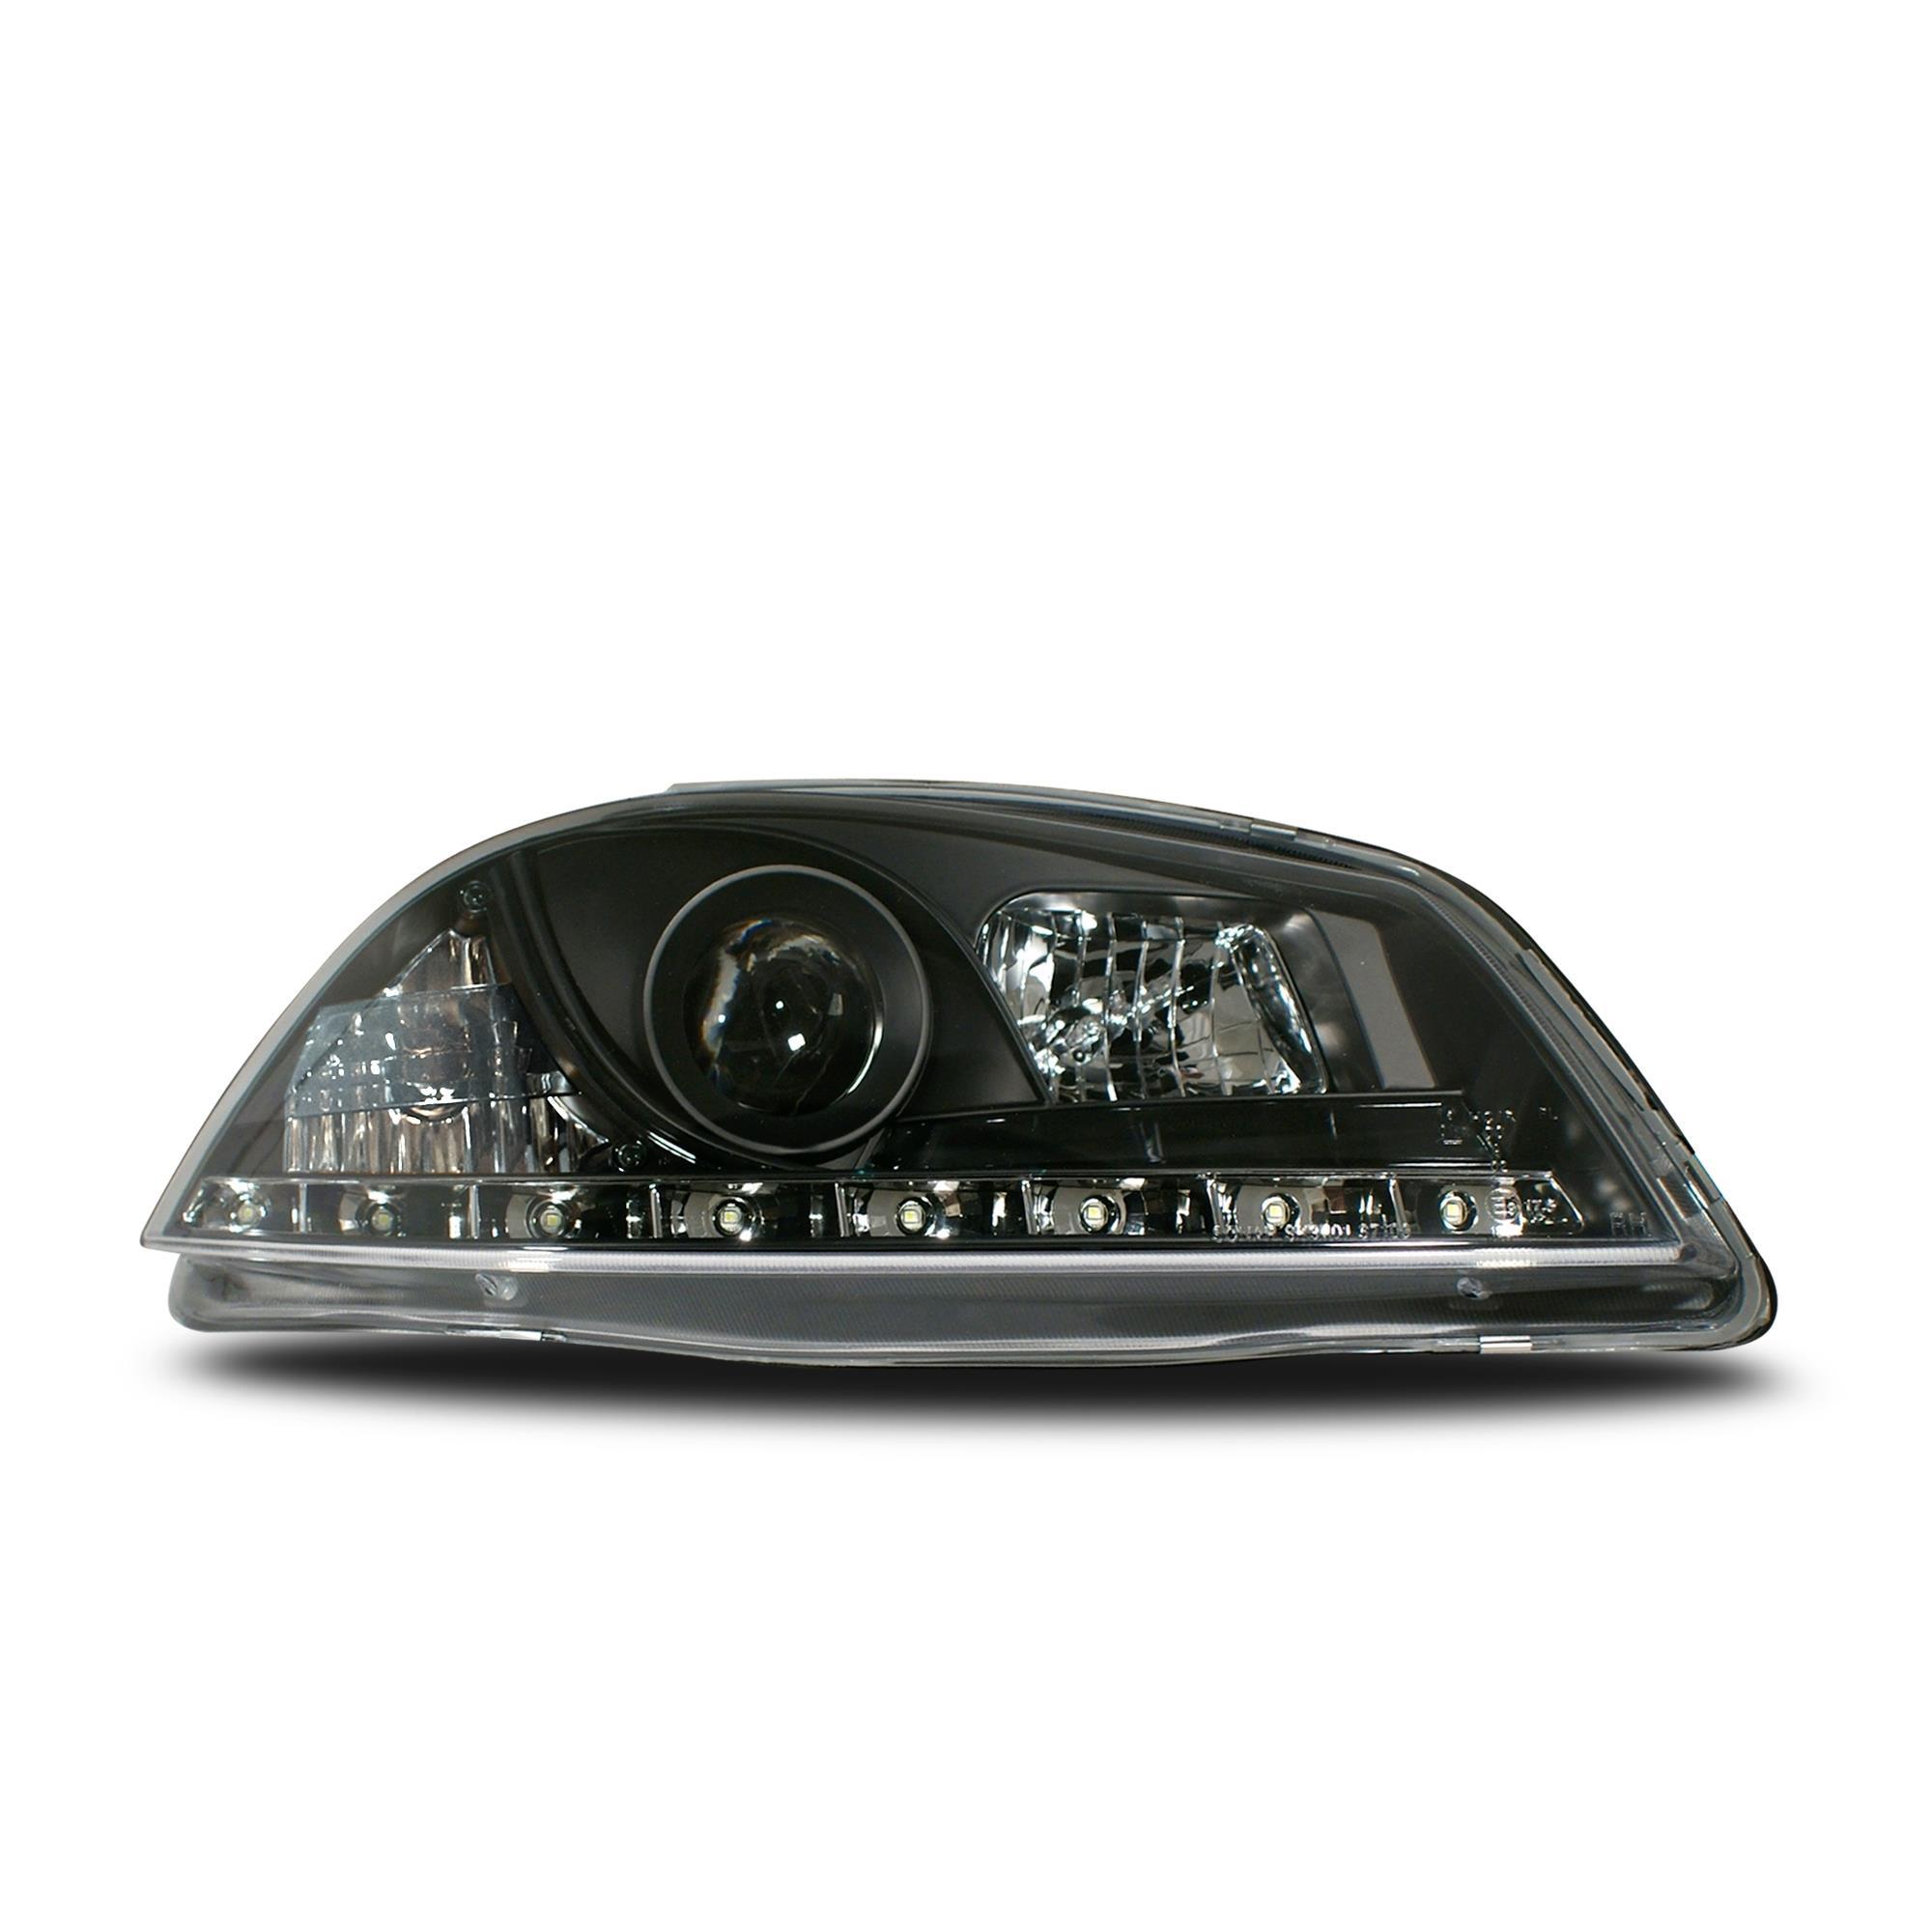 led front scheinwerfer seat ibiza 6l 02 08 tagfahrlicht. Black Bedroom Furniture Sets. Home Design Ideas